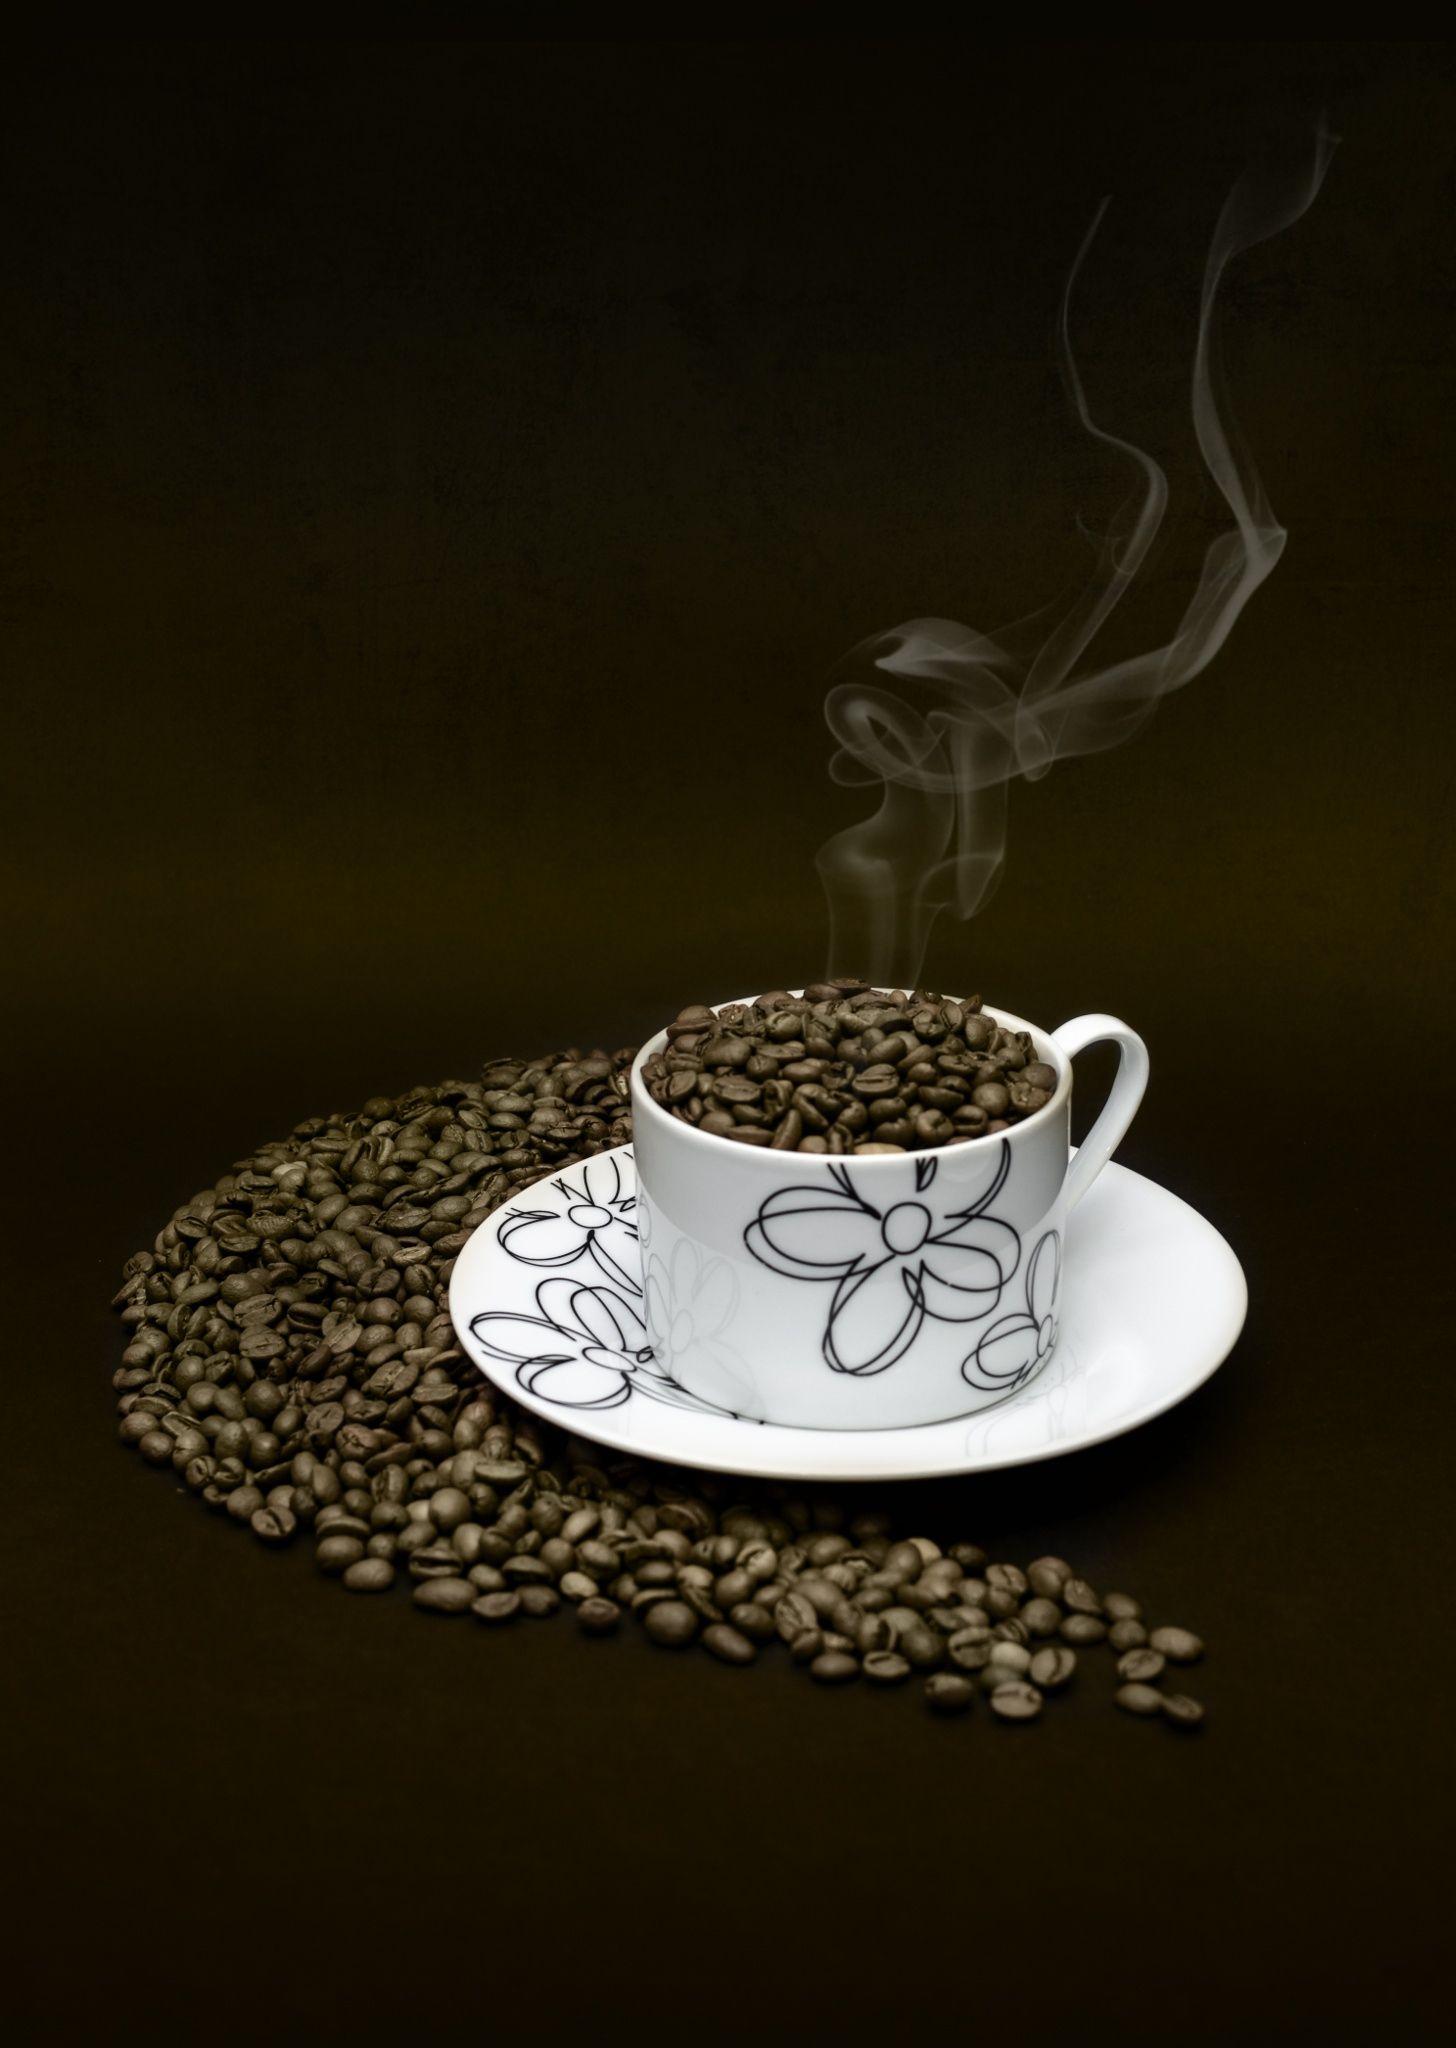 coffee by Davor Đopar on 500px